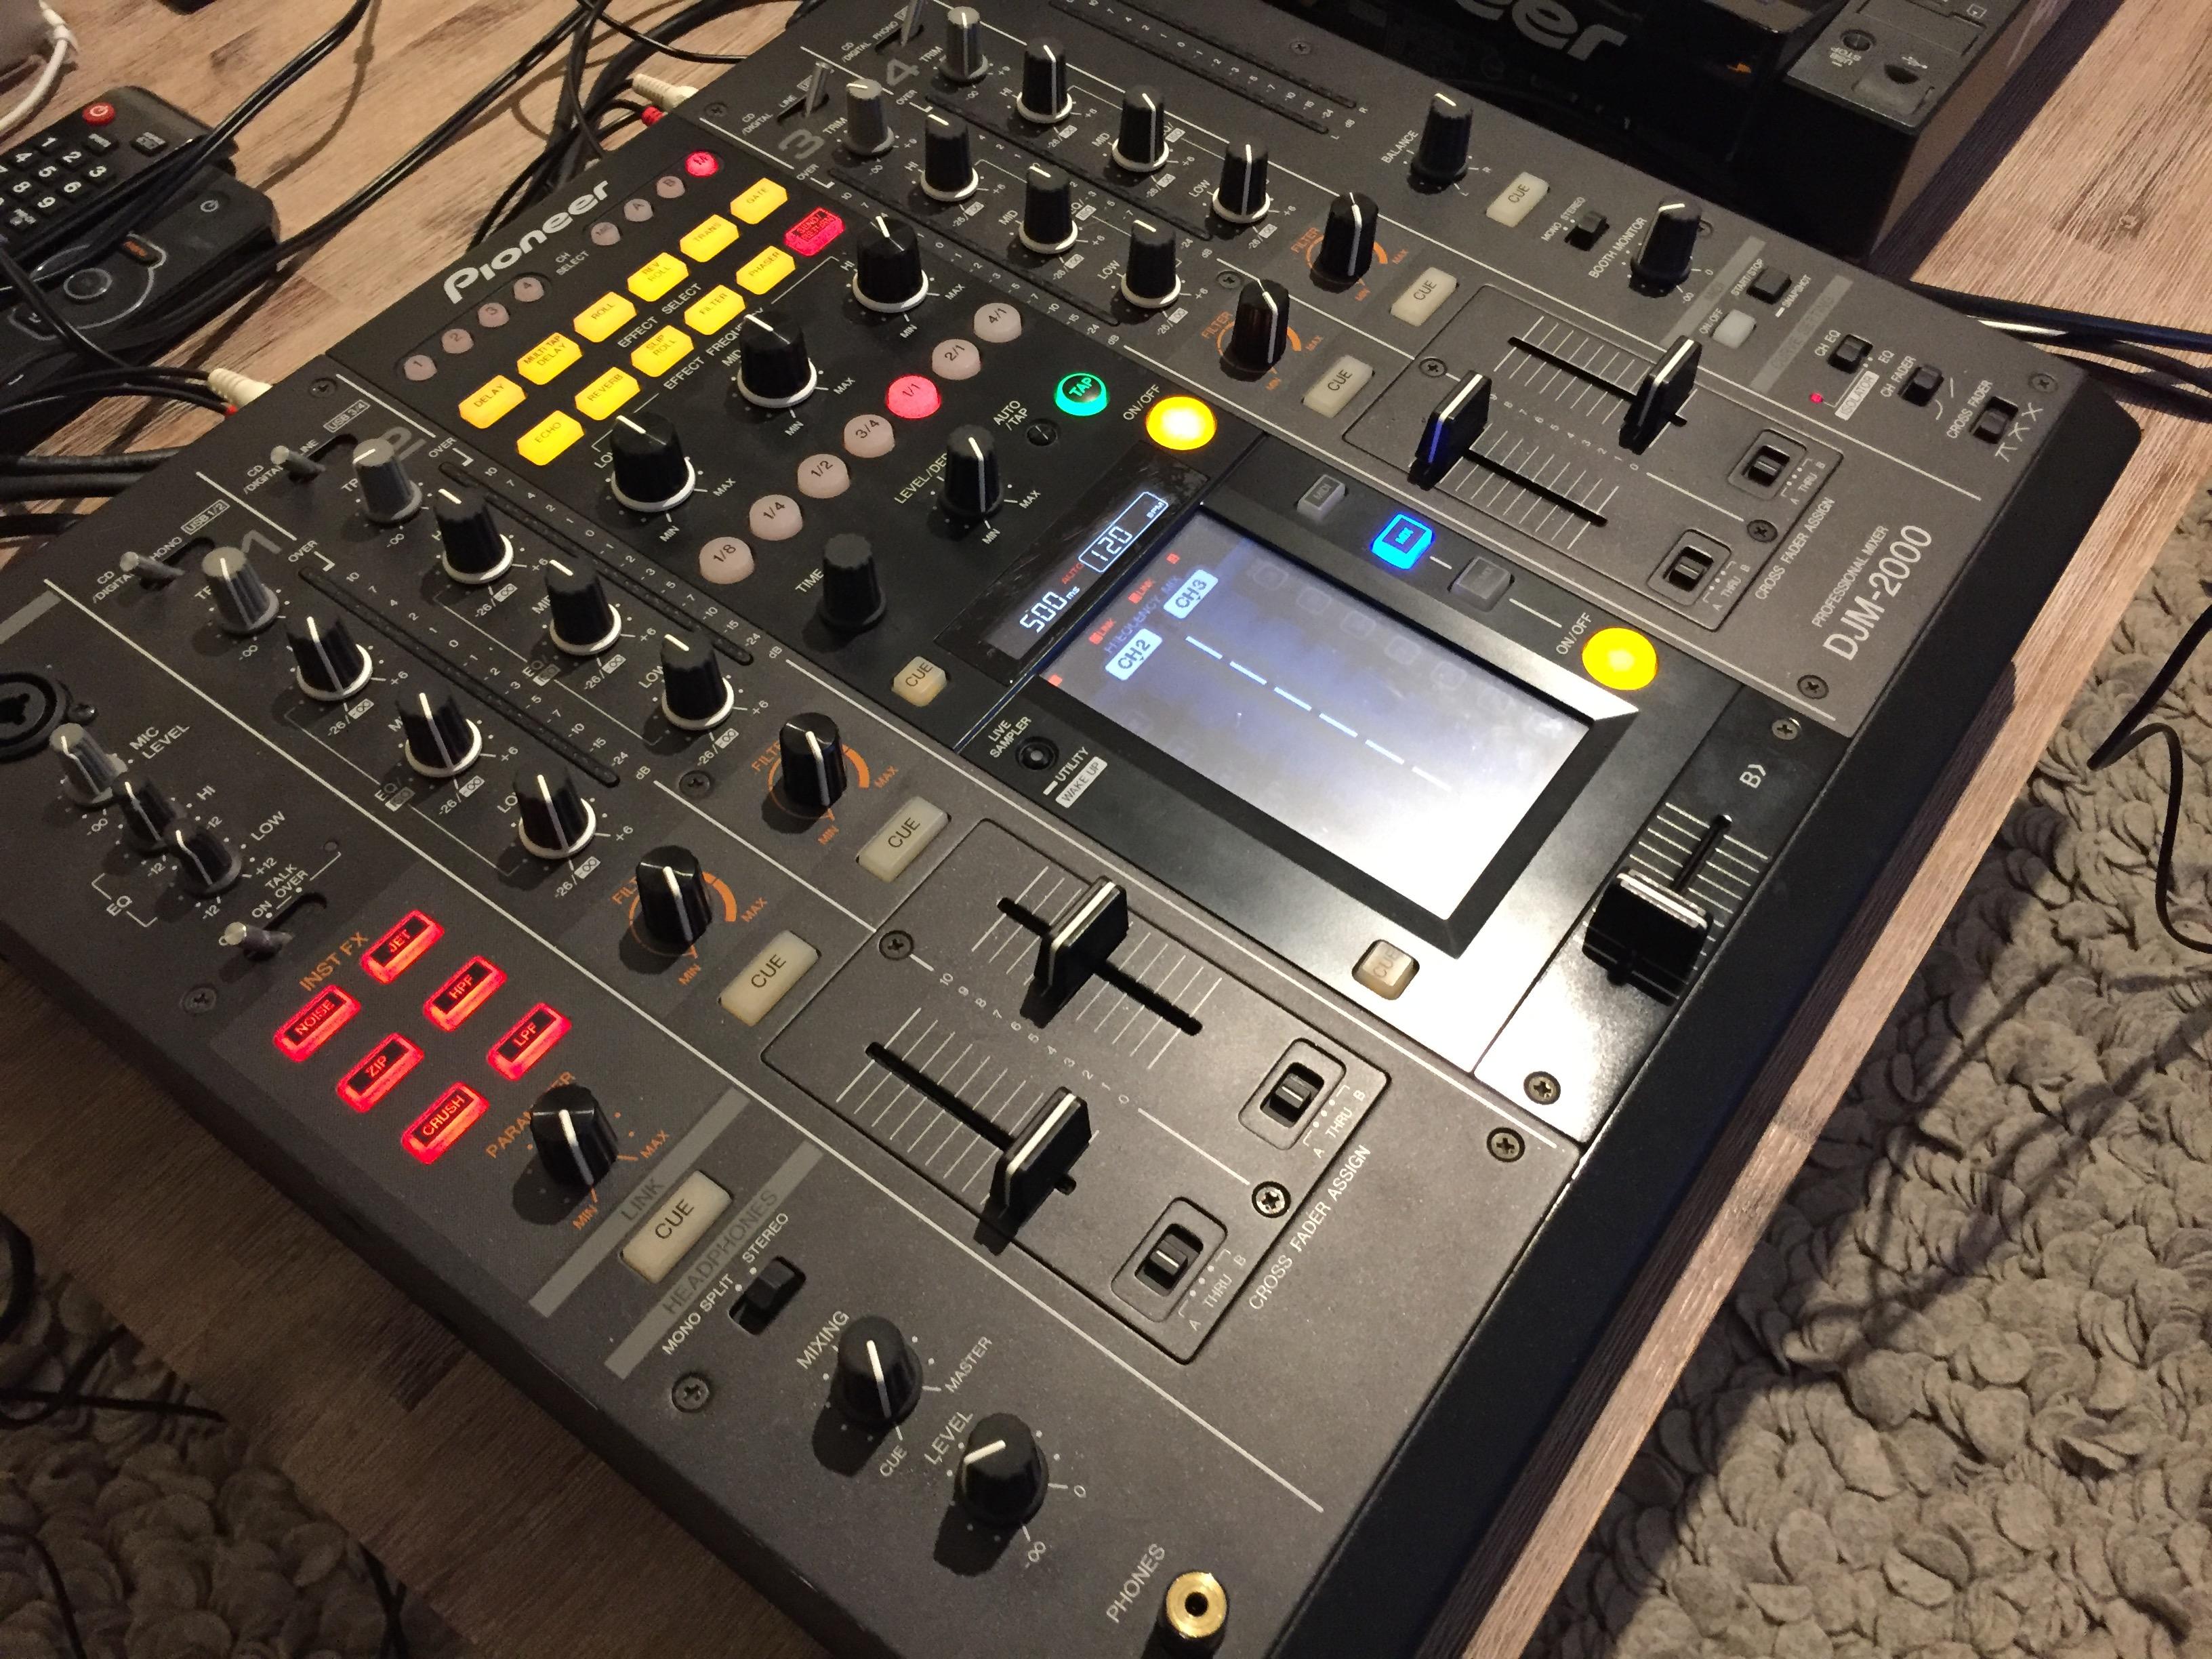 Vend table de mixage pioneer djm 2000 ile de france - Table de mixage pioneer occasion ...